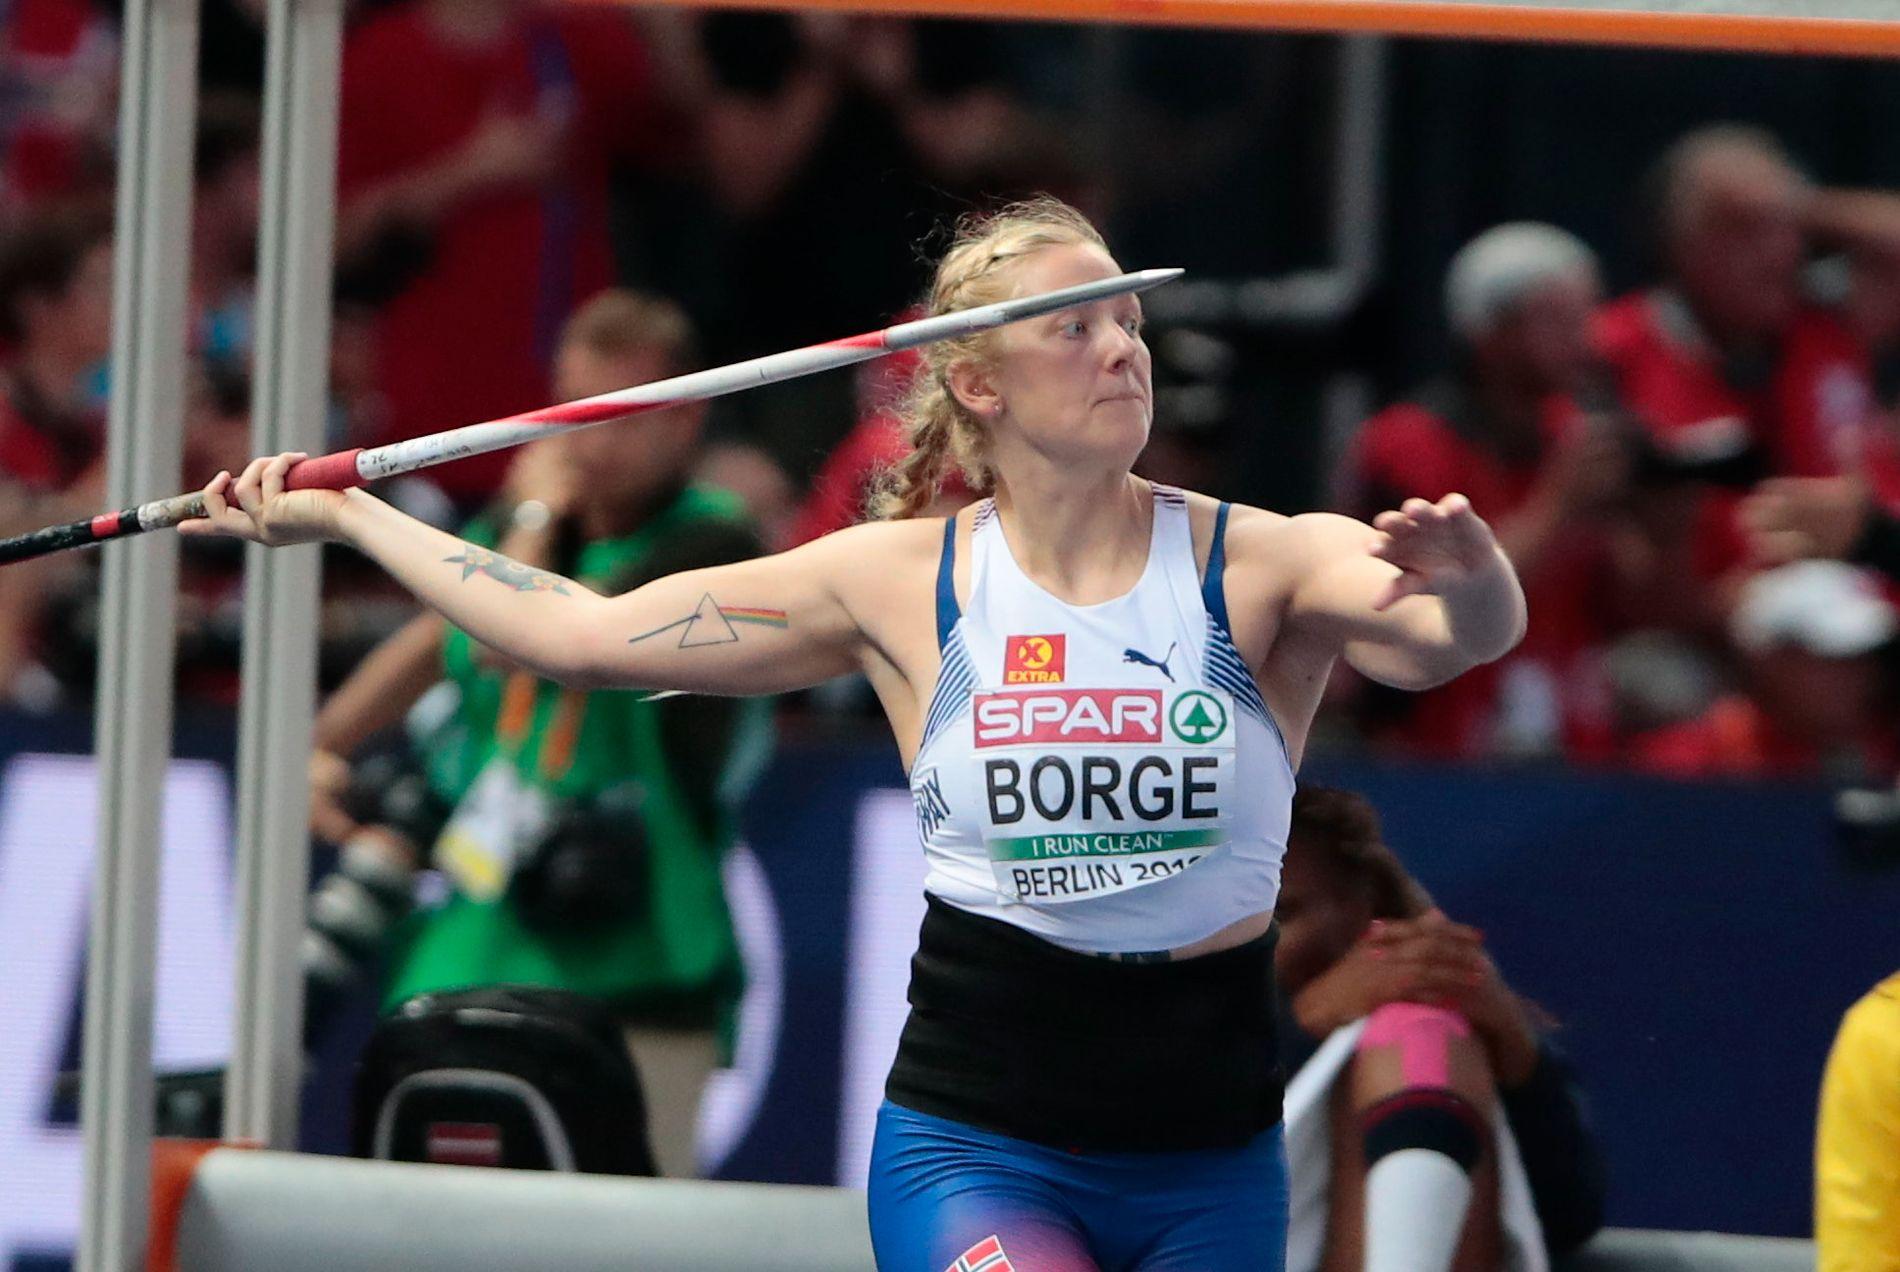 HEFTIG KAST-ARM: Sigrid Borge (22) er klar for Diamond League-finalen i spyd. Bildet er fra friidretts-EM for tre uker siden, der hun endte på 8. plass – med motivet fra Pink Floyds «The Dark Side of The Moon» tatovert på høyre overarm.